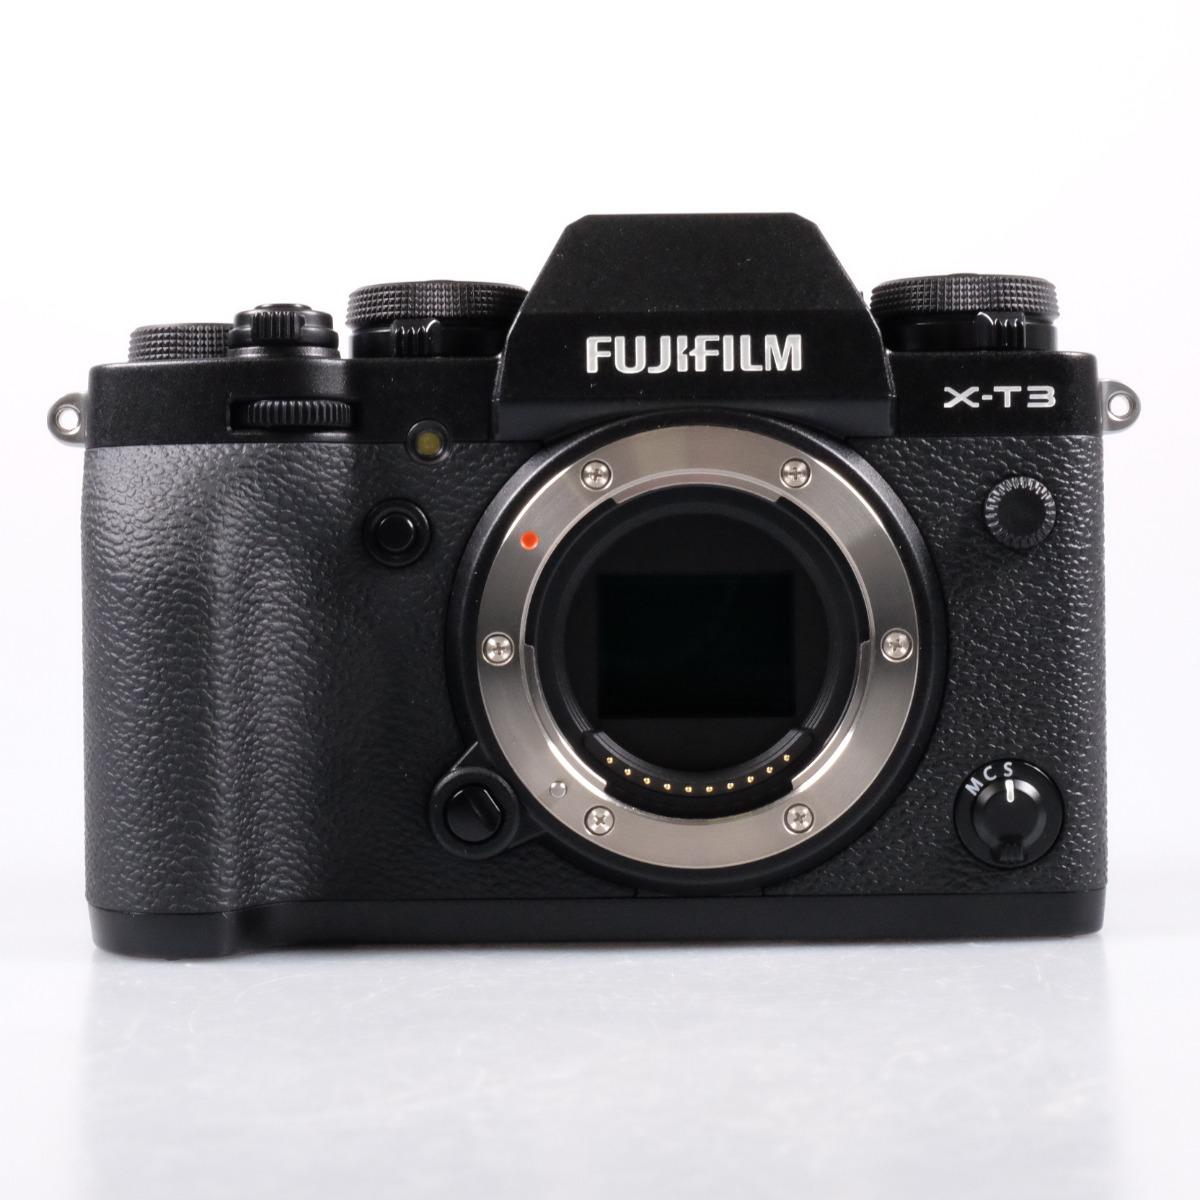 Used Fujifilm X-T3 Mirrorless Camera Body